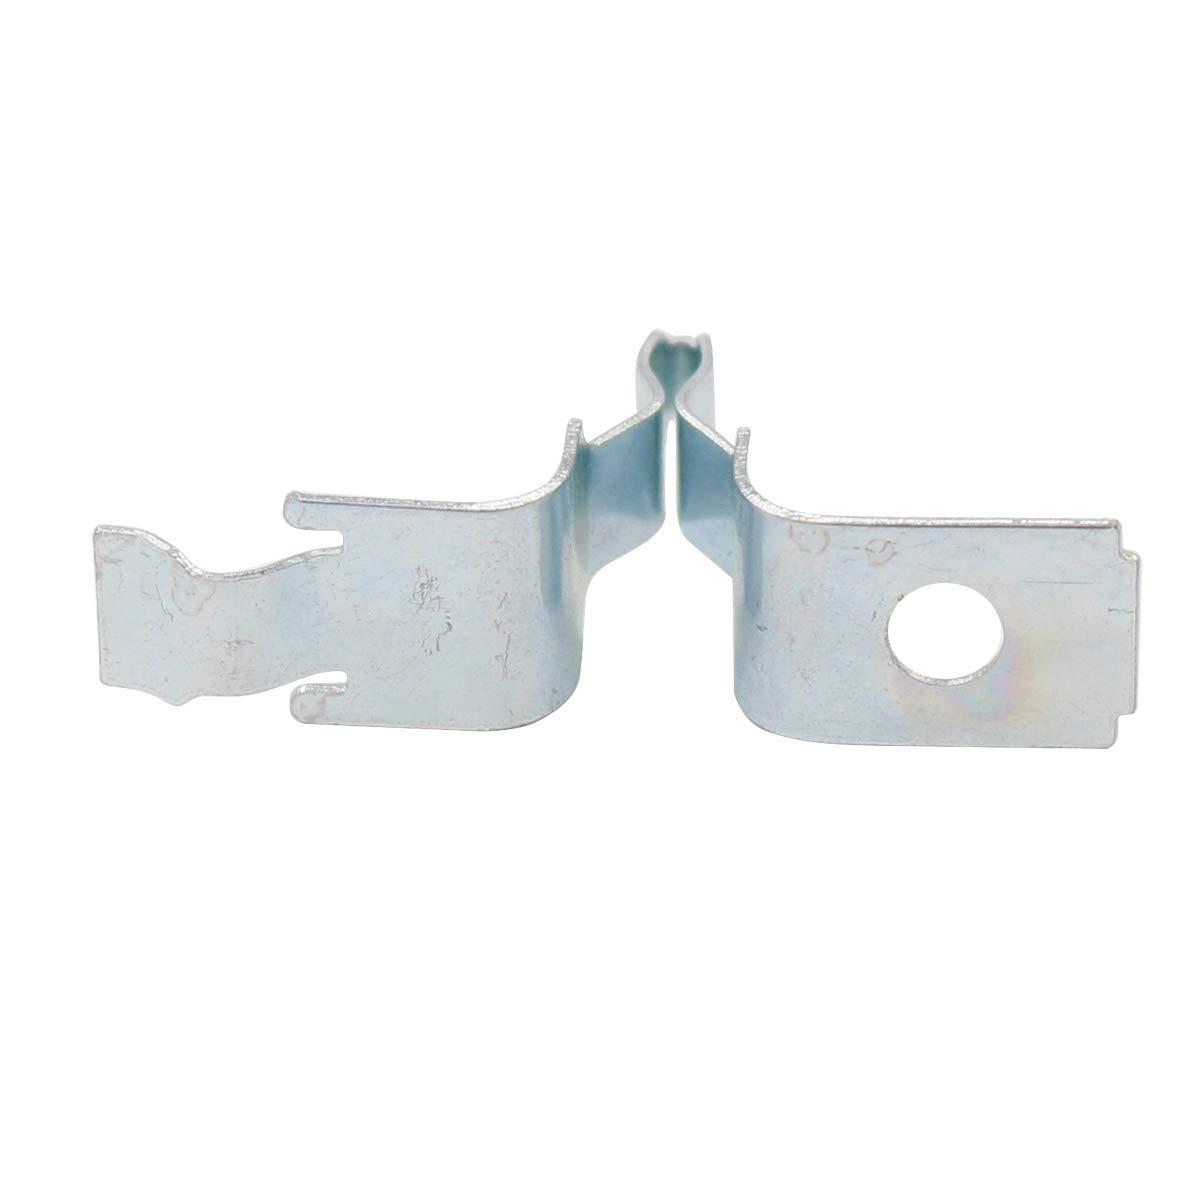 279570 ApplianPar 4 Pack 279570 Dryer Door Latch Strike Kit for Whirlpool Kenmore Maytag KitchenAid Dryers AP3094183 PS334230